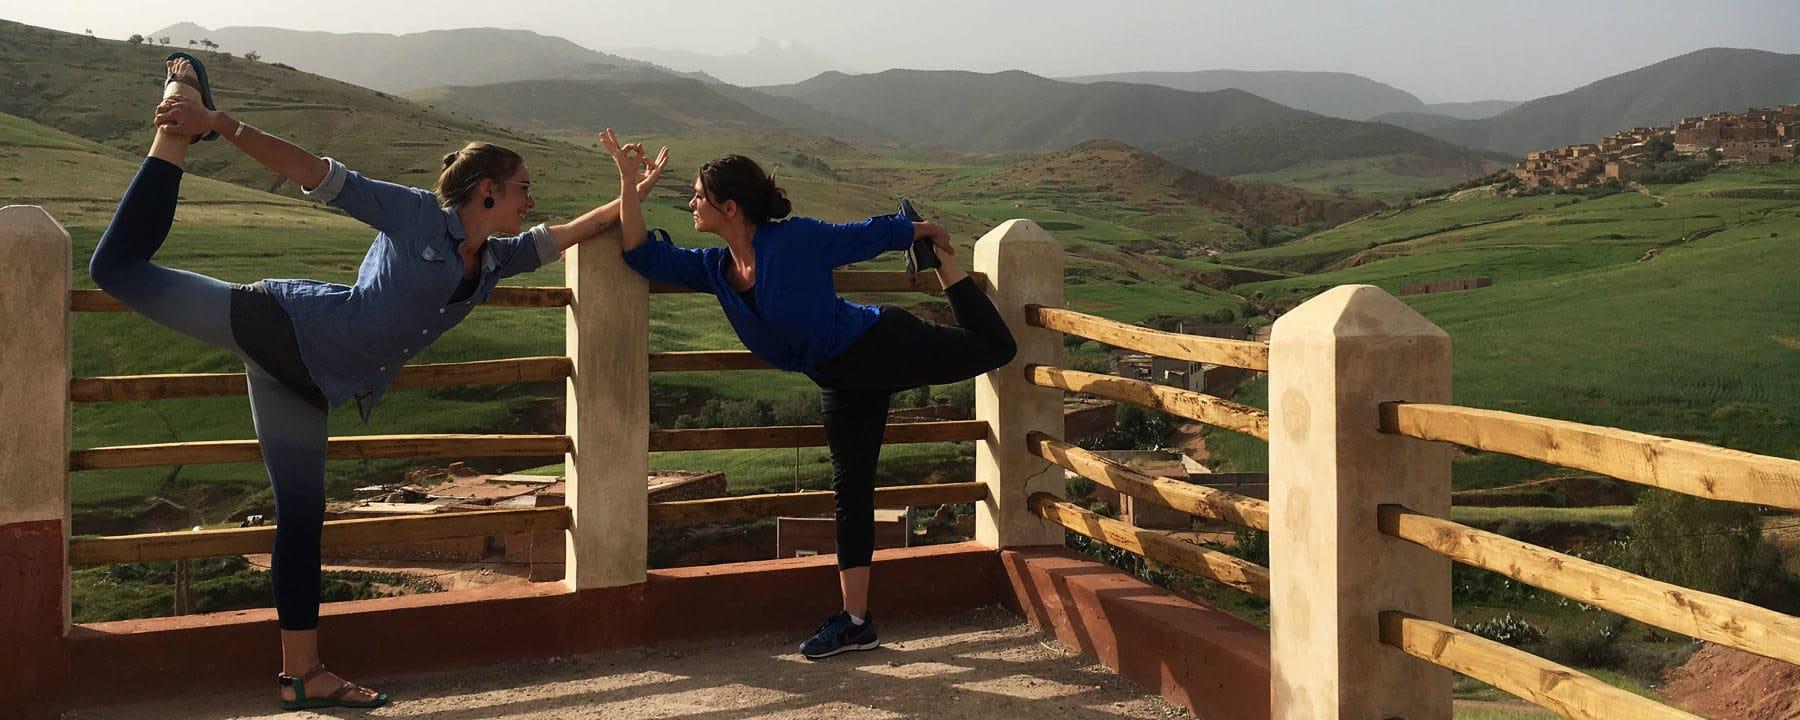 yoga-wander-retreat-marokko_source-nosade